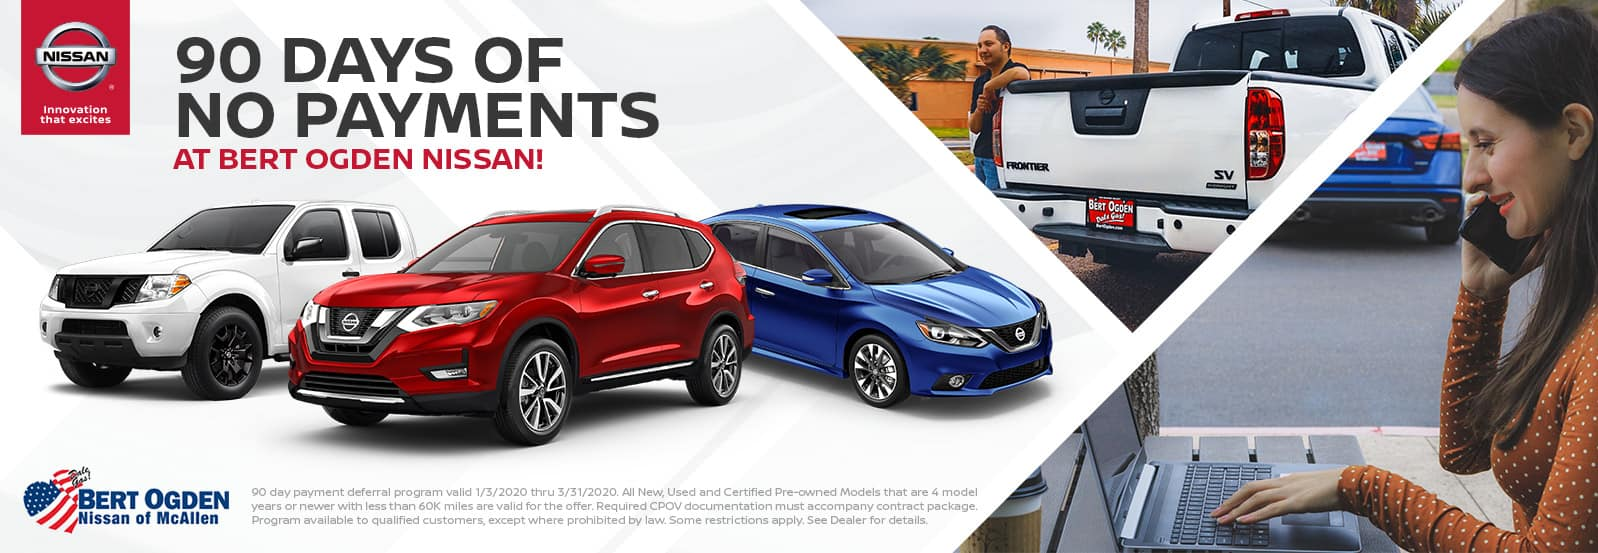 90 Days of No Payments at Bert Ogden Nissan in McAllen, TX